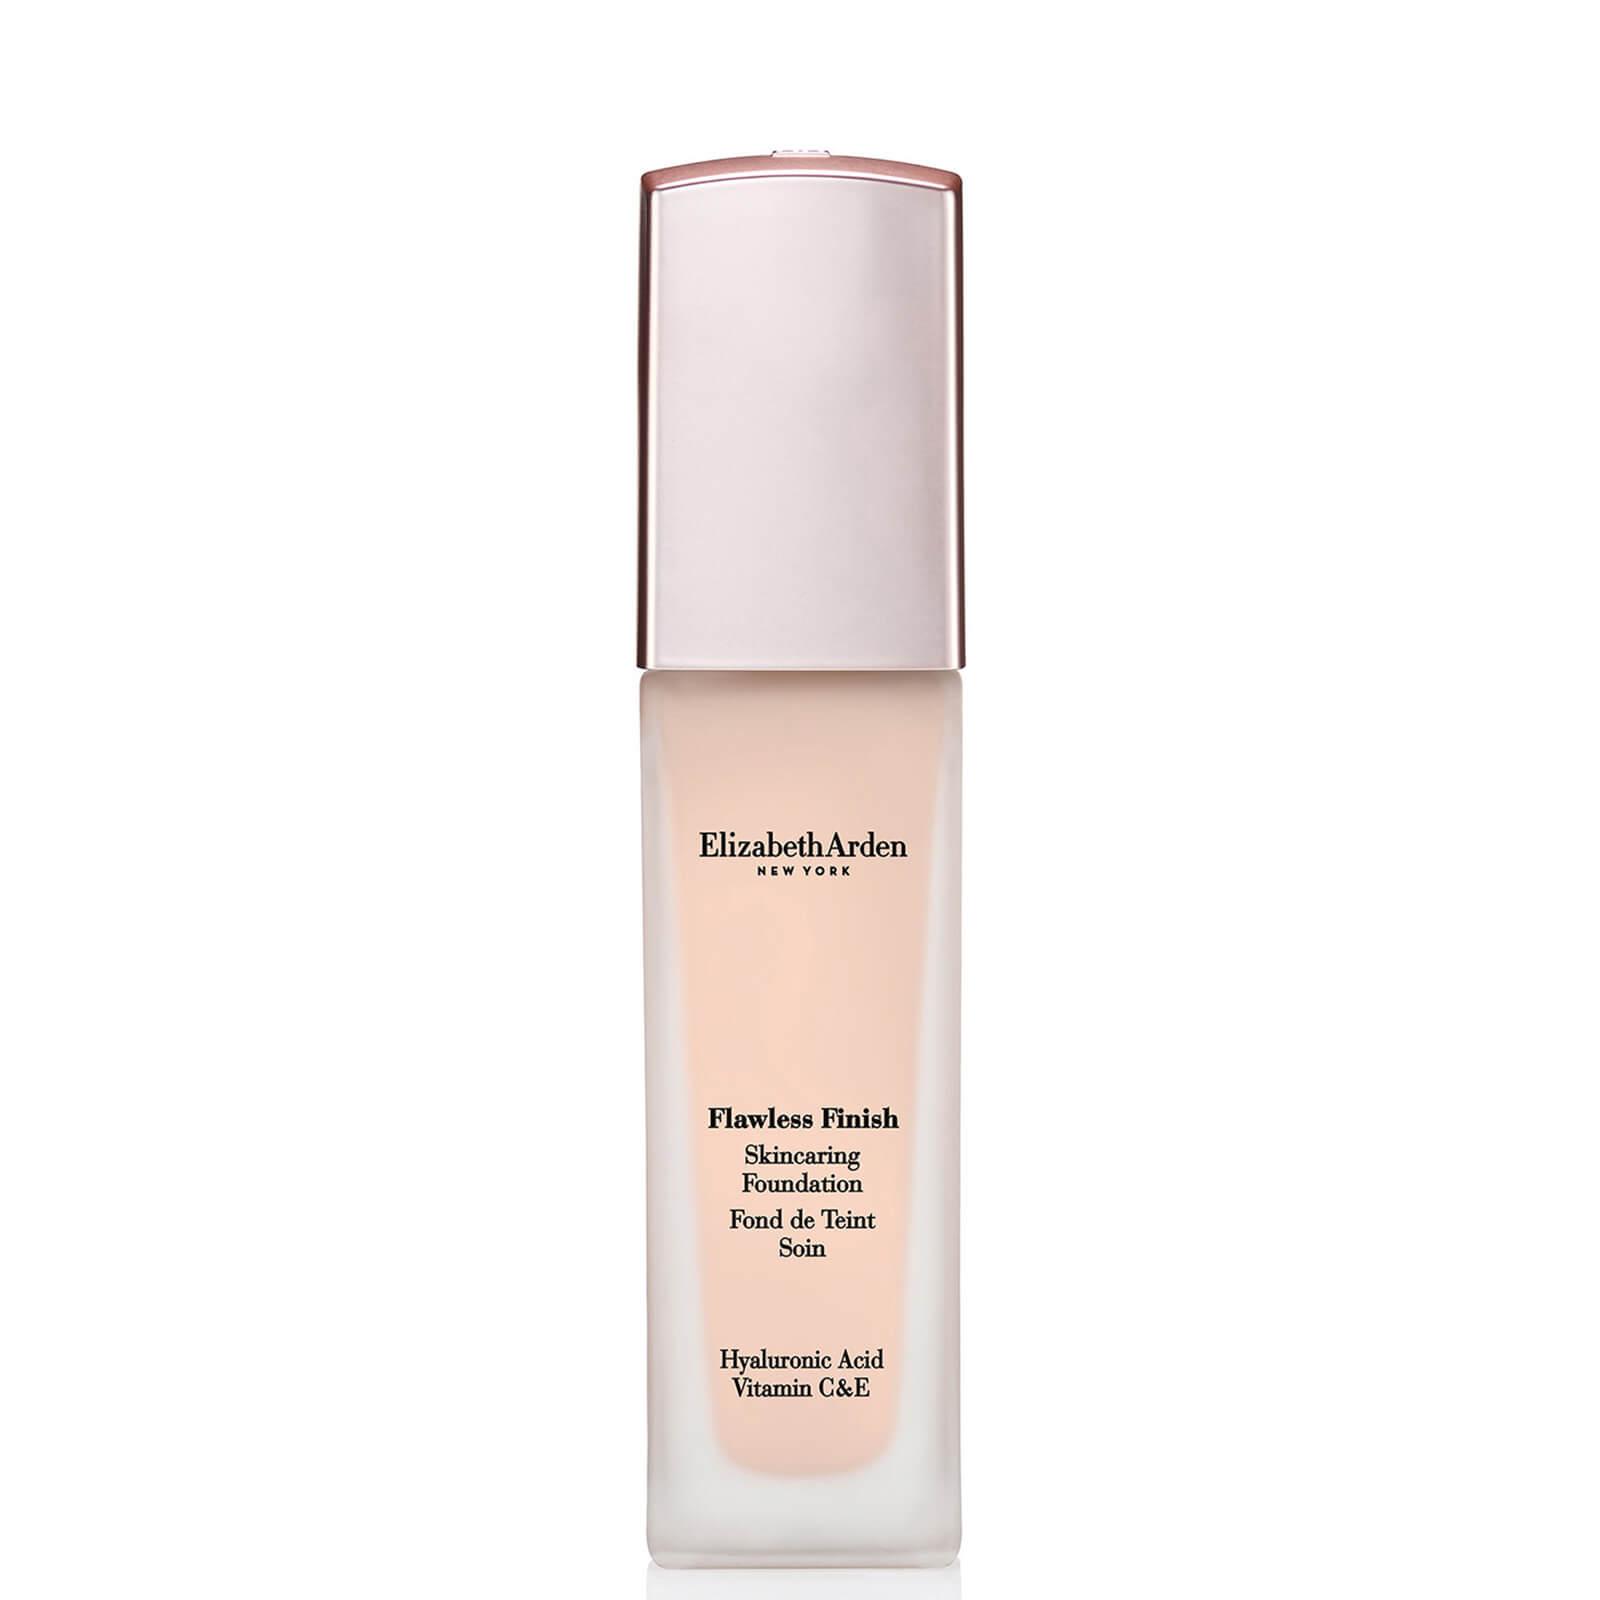 Купить Elizabeth Arden Flawless Finish Skincaring Foundation 30ml (Various Shades) - 110N